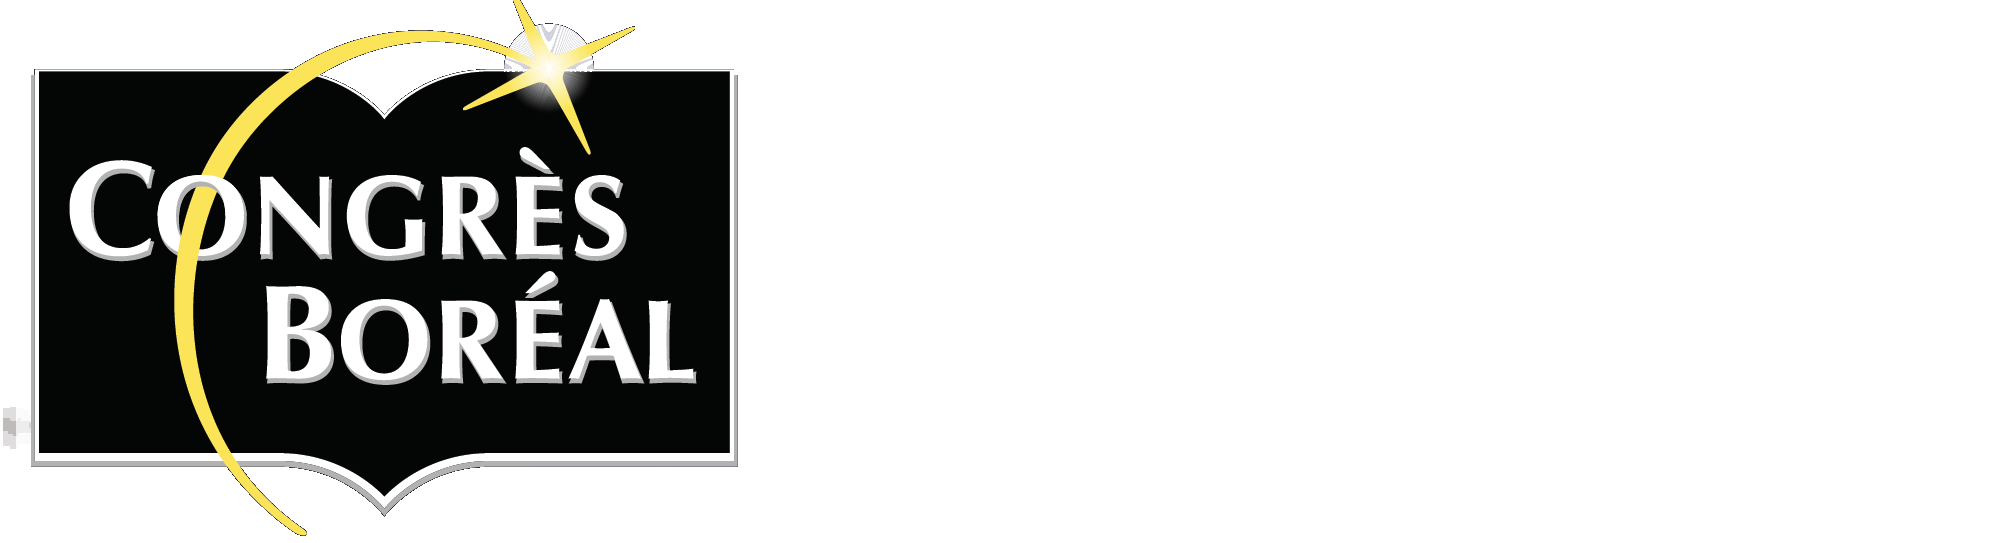 Congrès Boréal